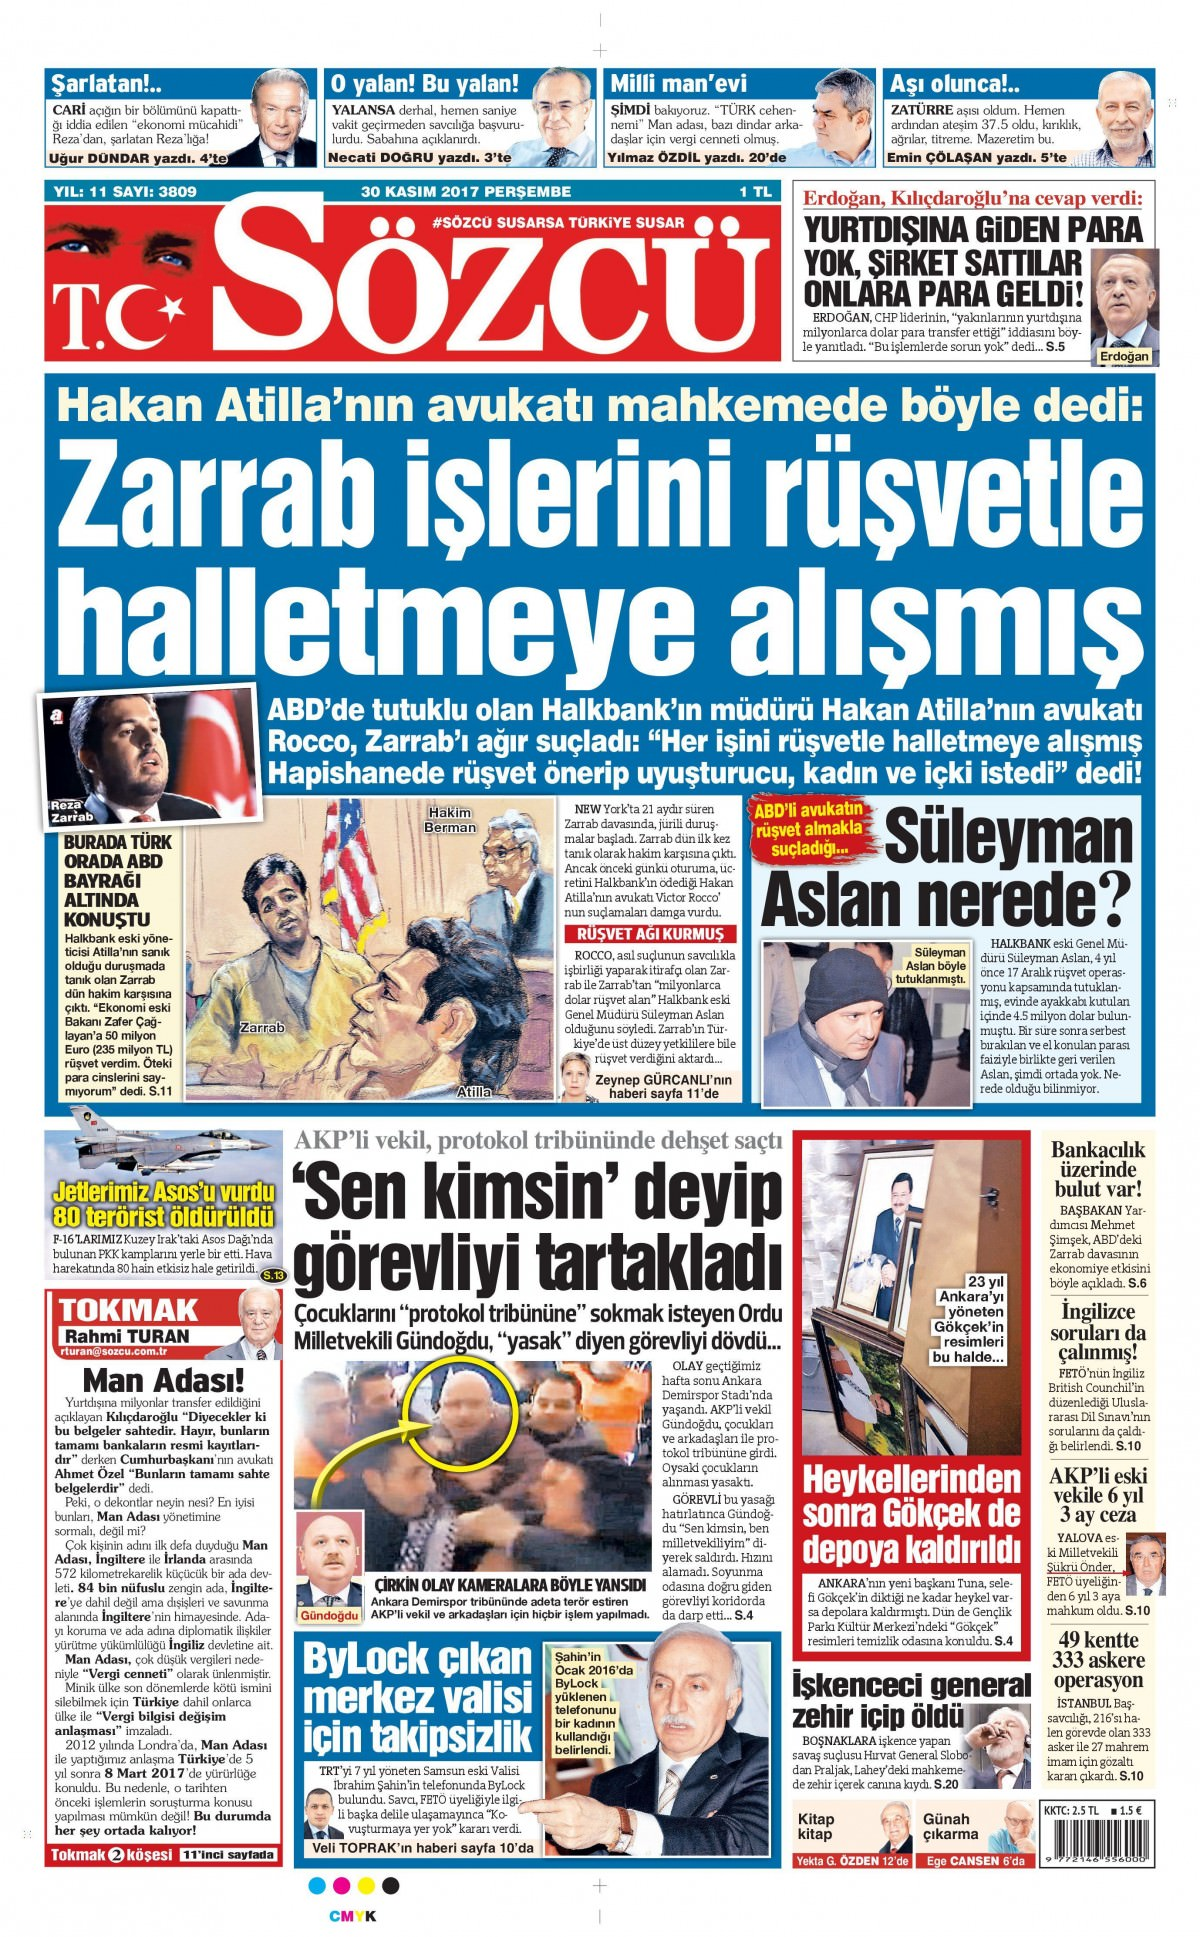 Gazeteler bugün hangi manşeti attı 13